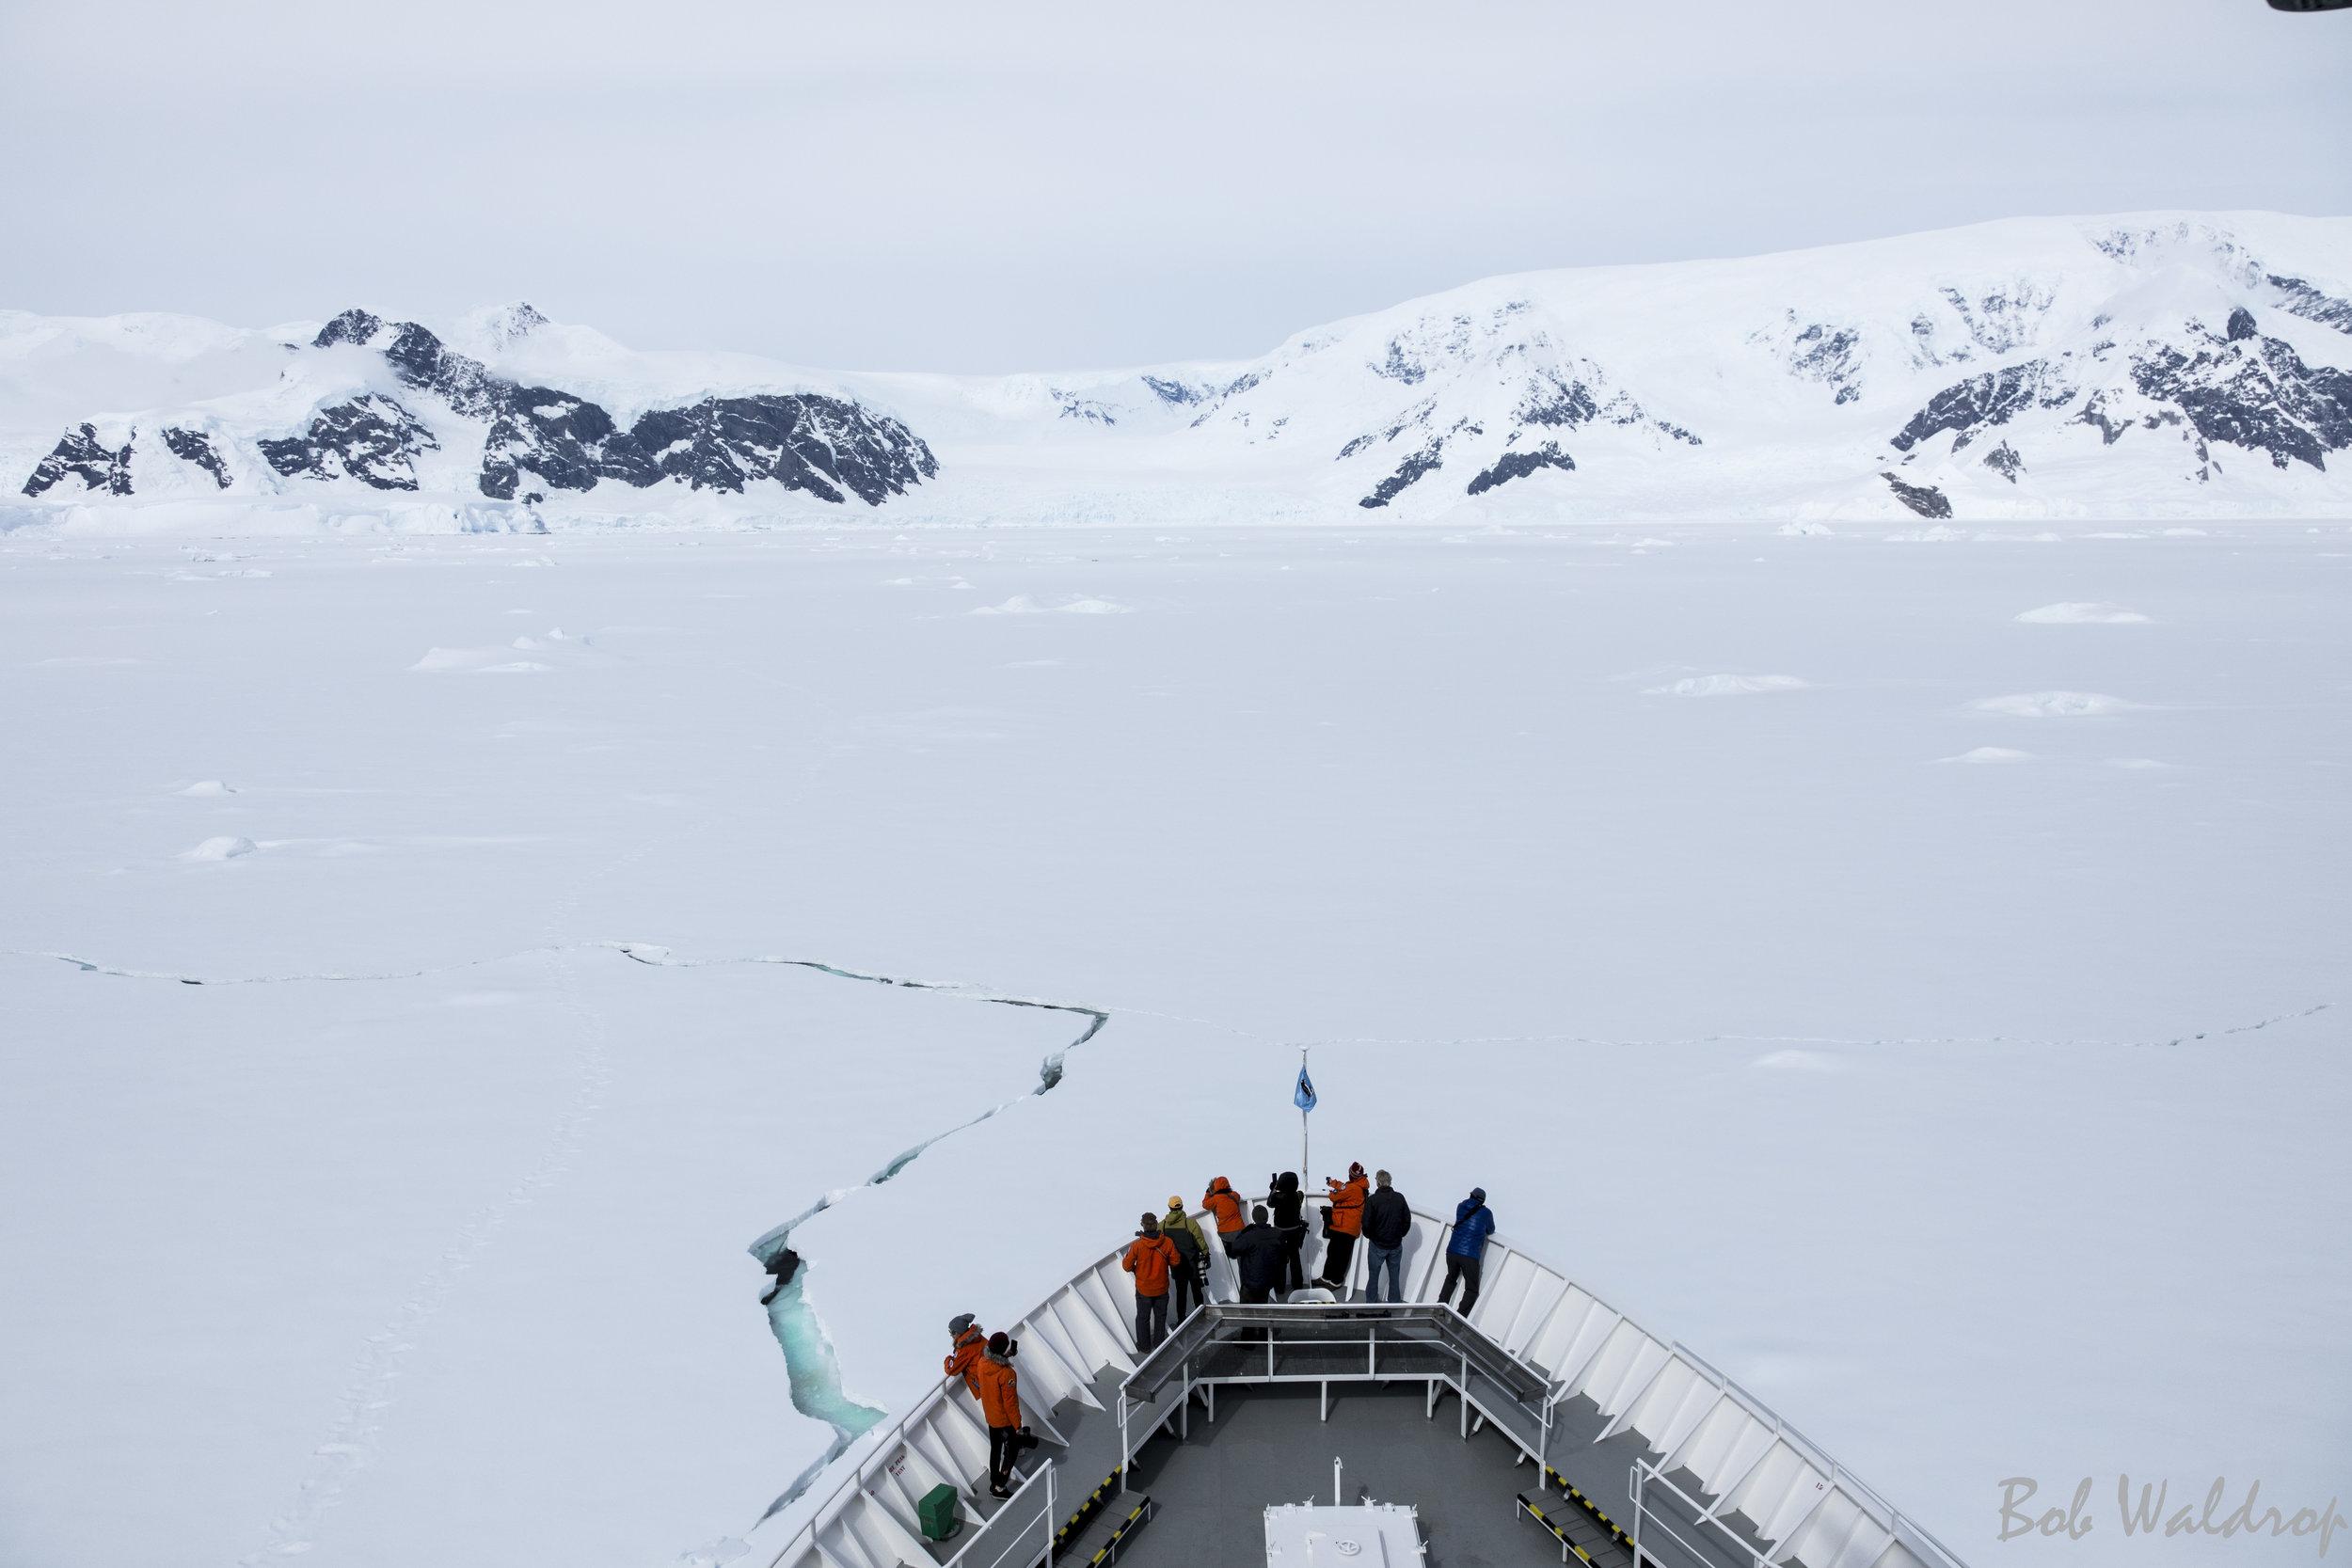 Antarctica-9851-2-Edit.JPG